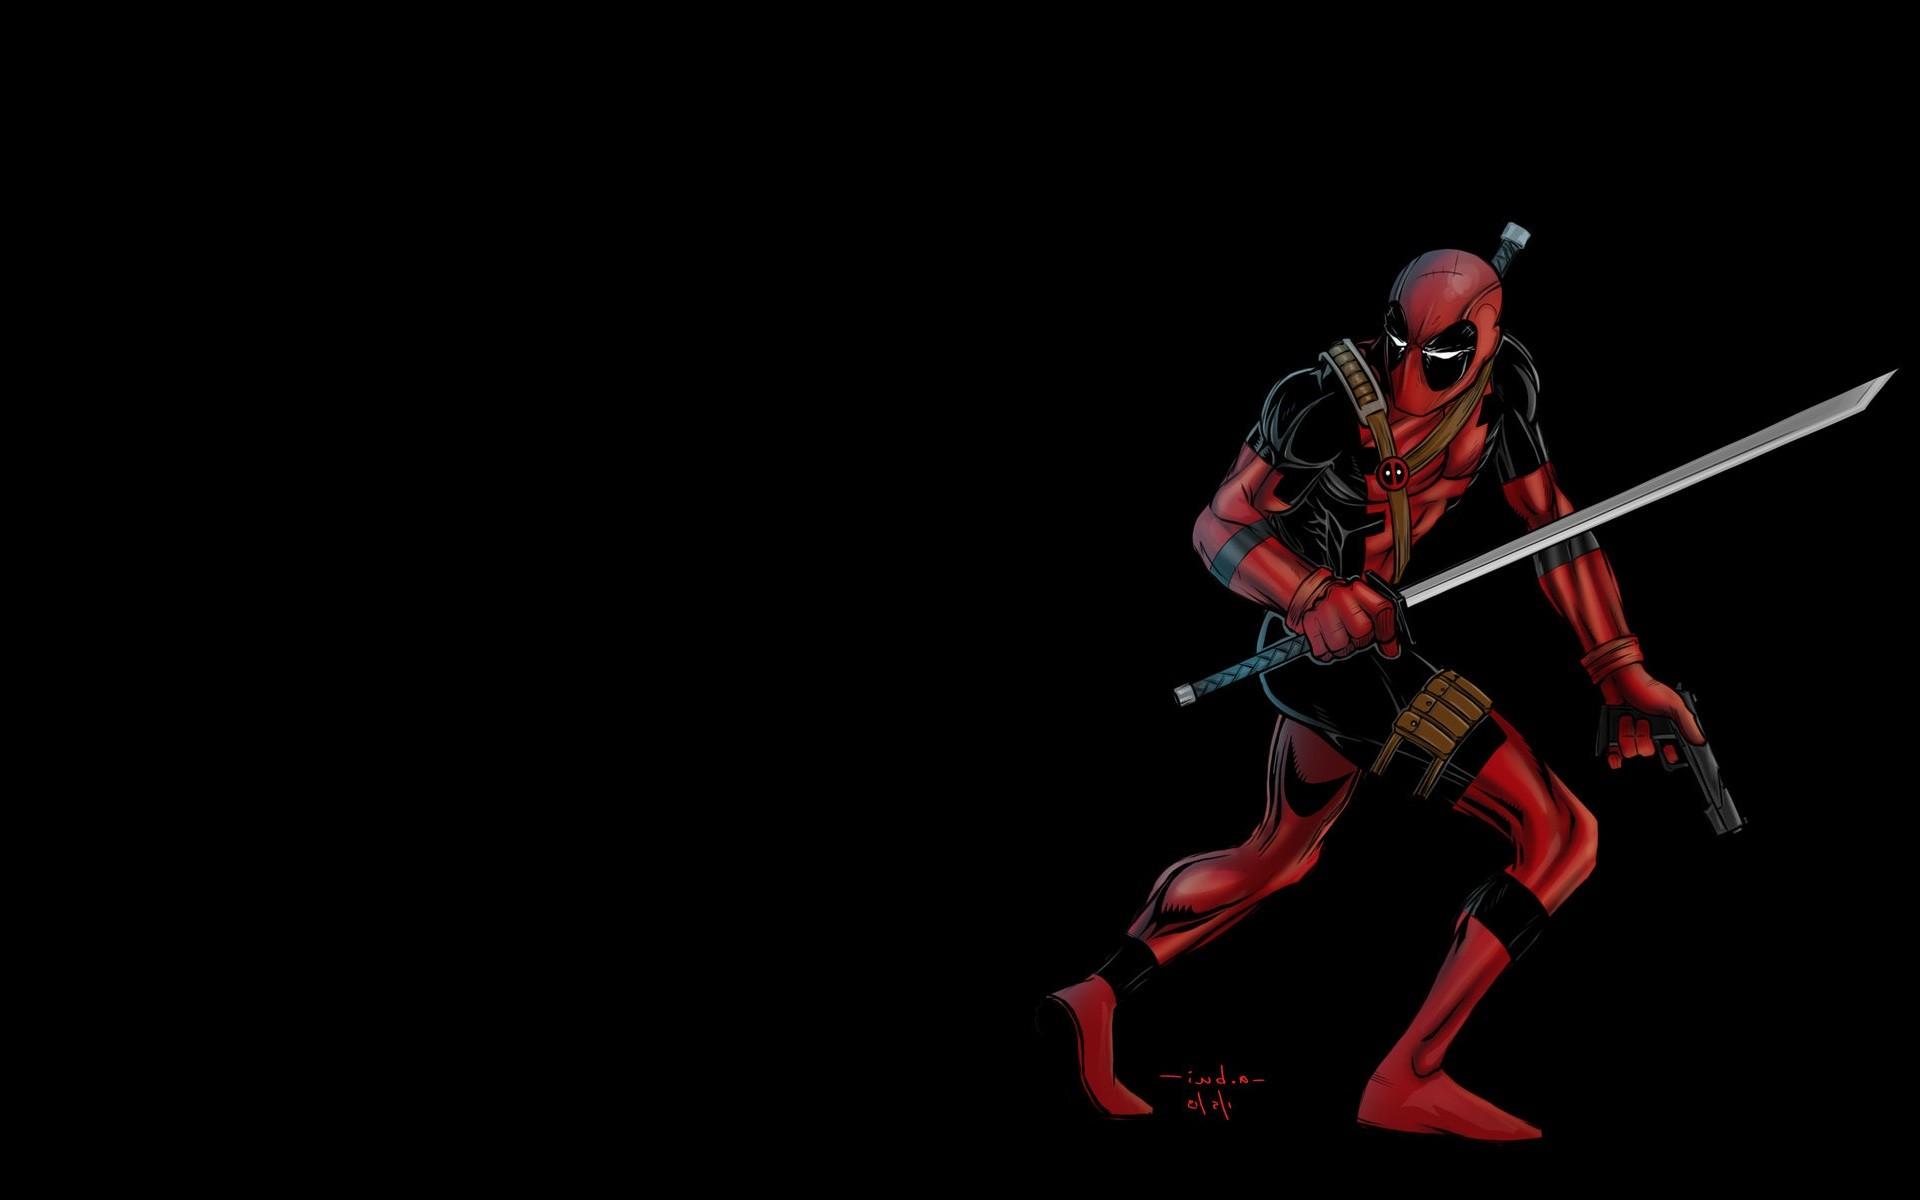 Deadpool Desktop Background Wallpaper.